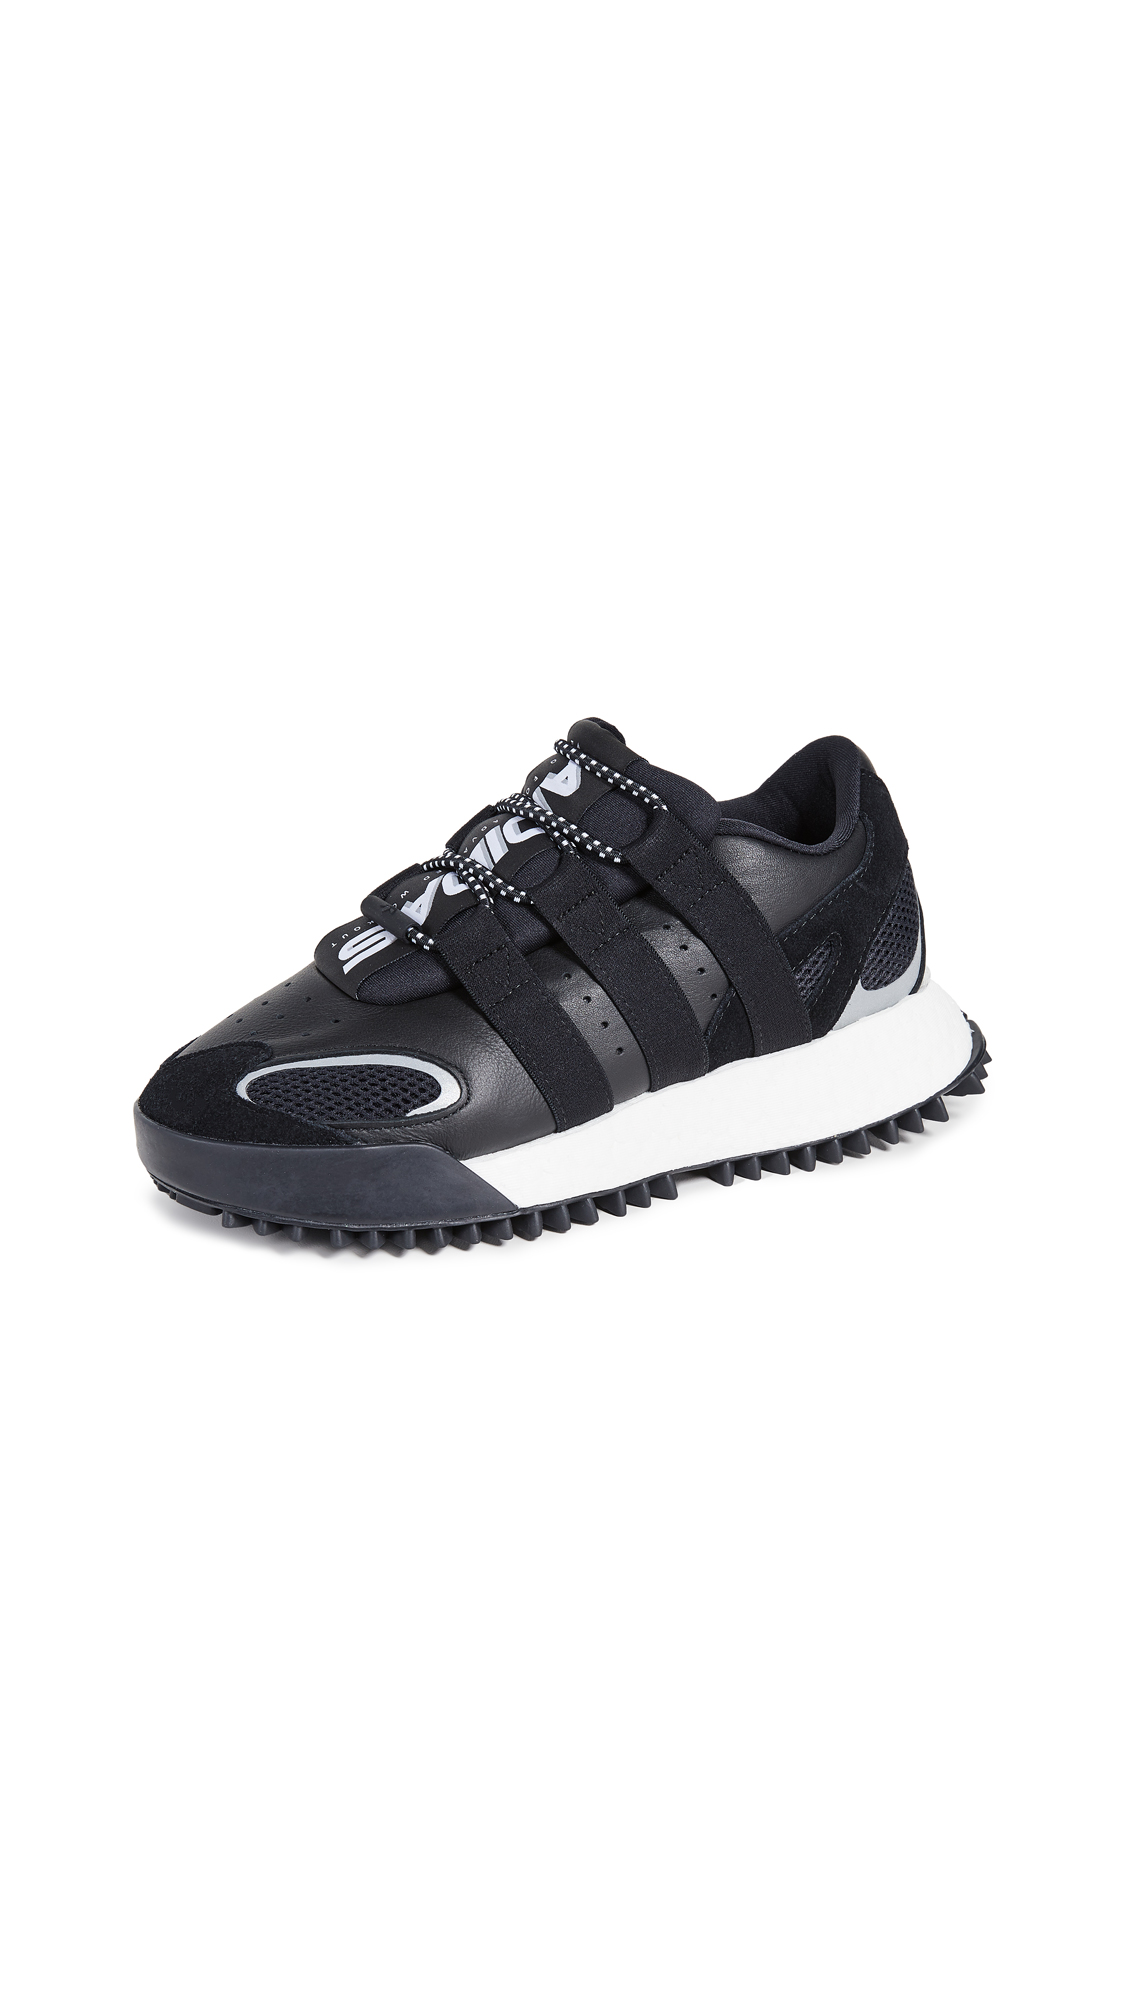 adidas Originals by Alexander Wang AW Wangbody Run Sneakers - Core Black